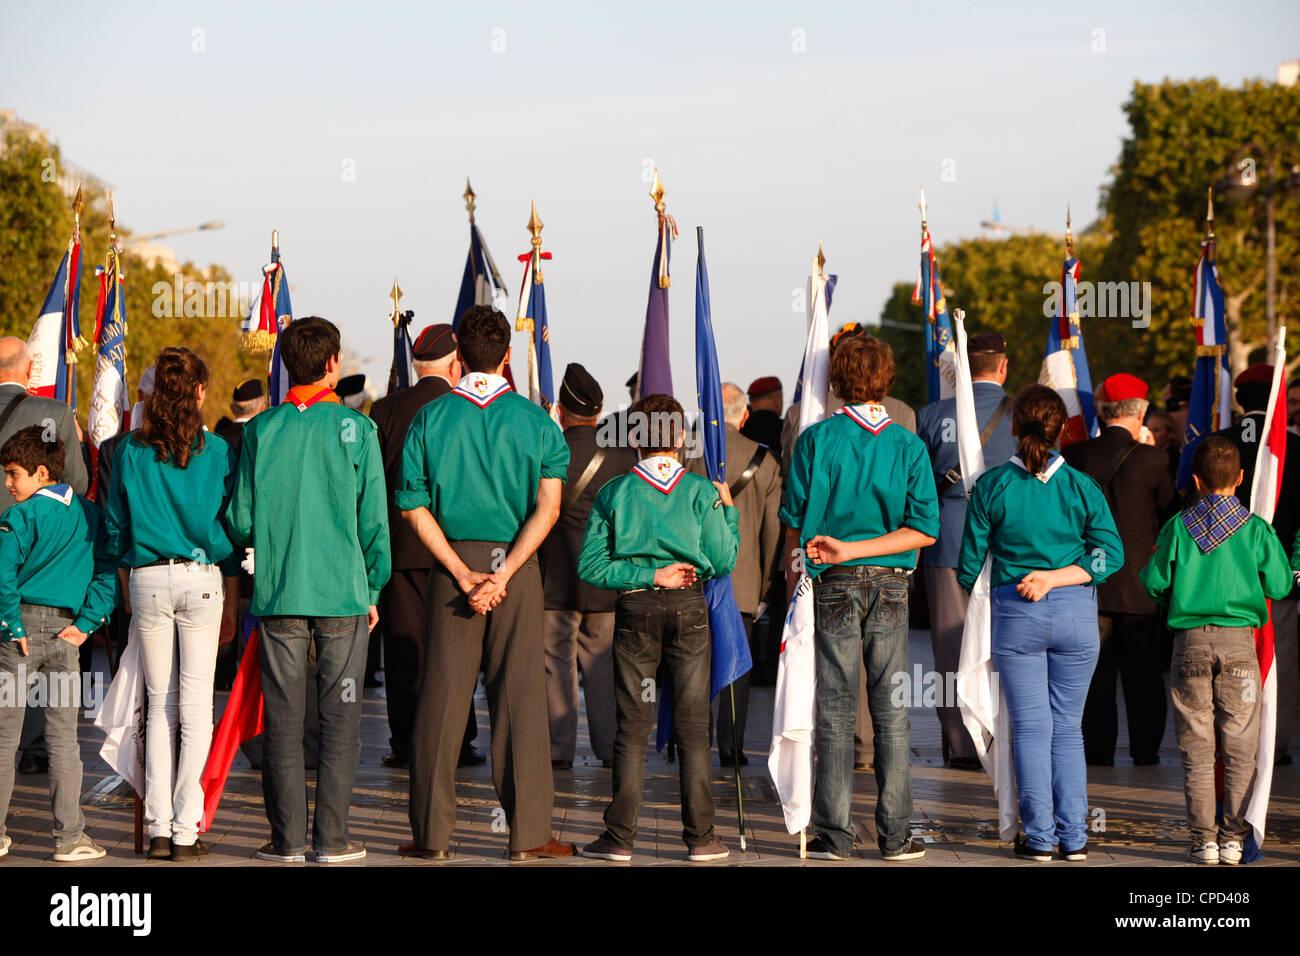 Muslim scouts at the Arc de Triomphe, Paris, France, Europe - Stock Image